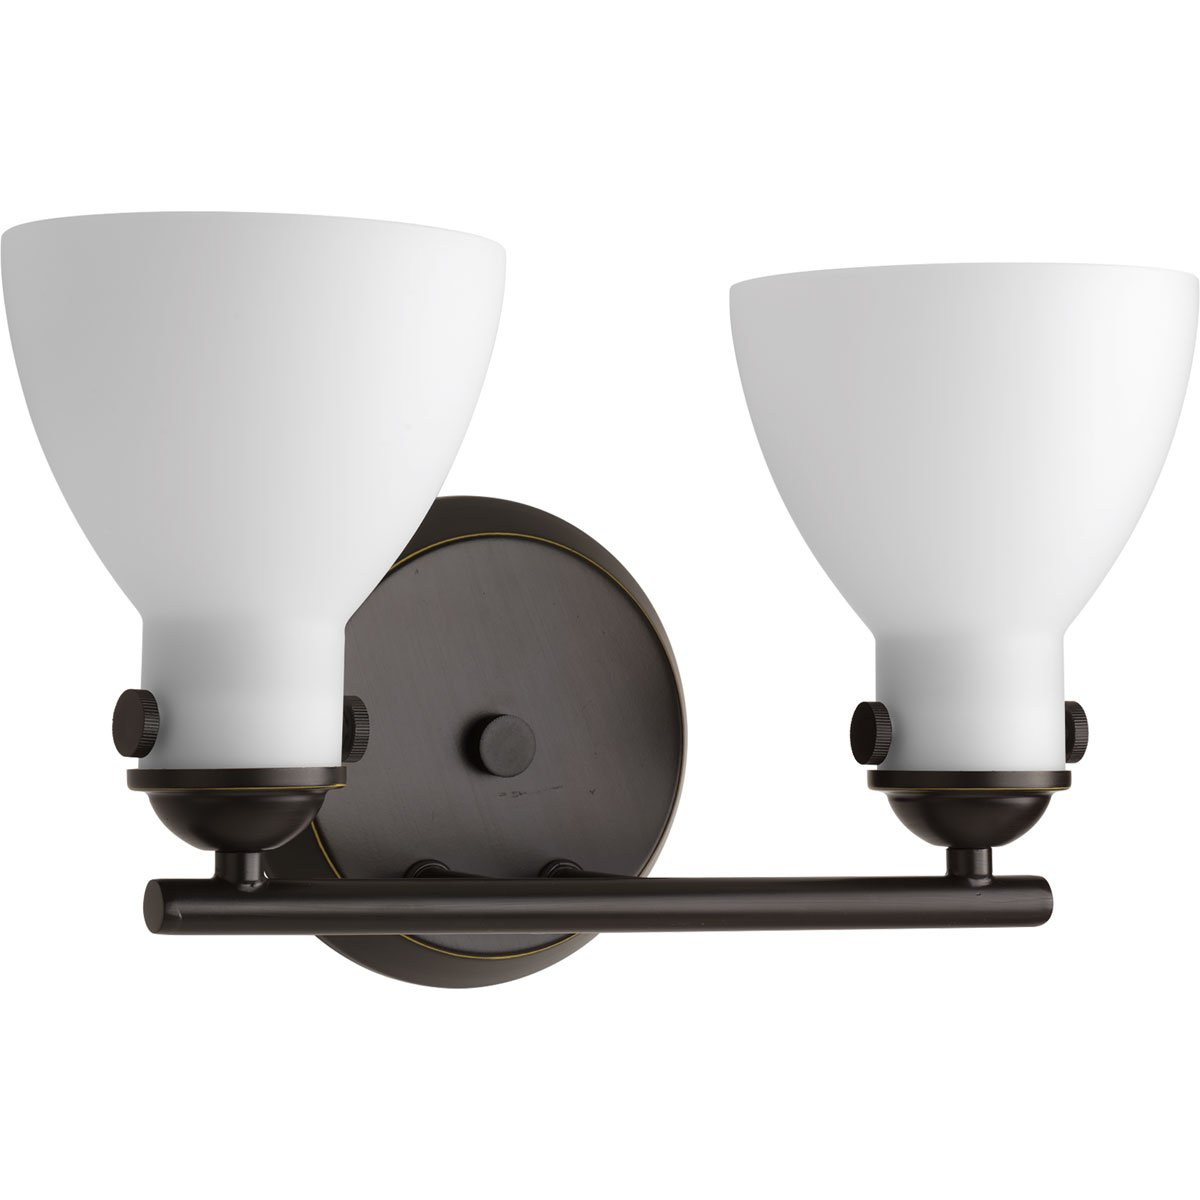 Antique Bronze HI Progress Lighting P2771-20 Contemporary//Soft 2-100W Med Bath Bracket Progress Lighting